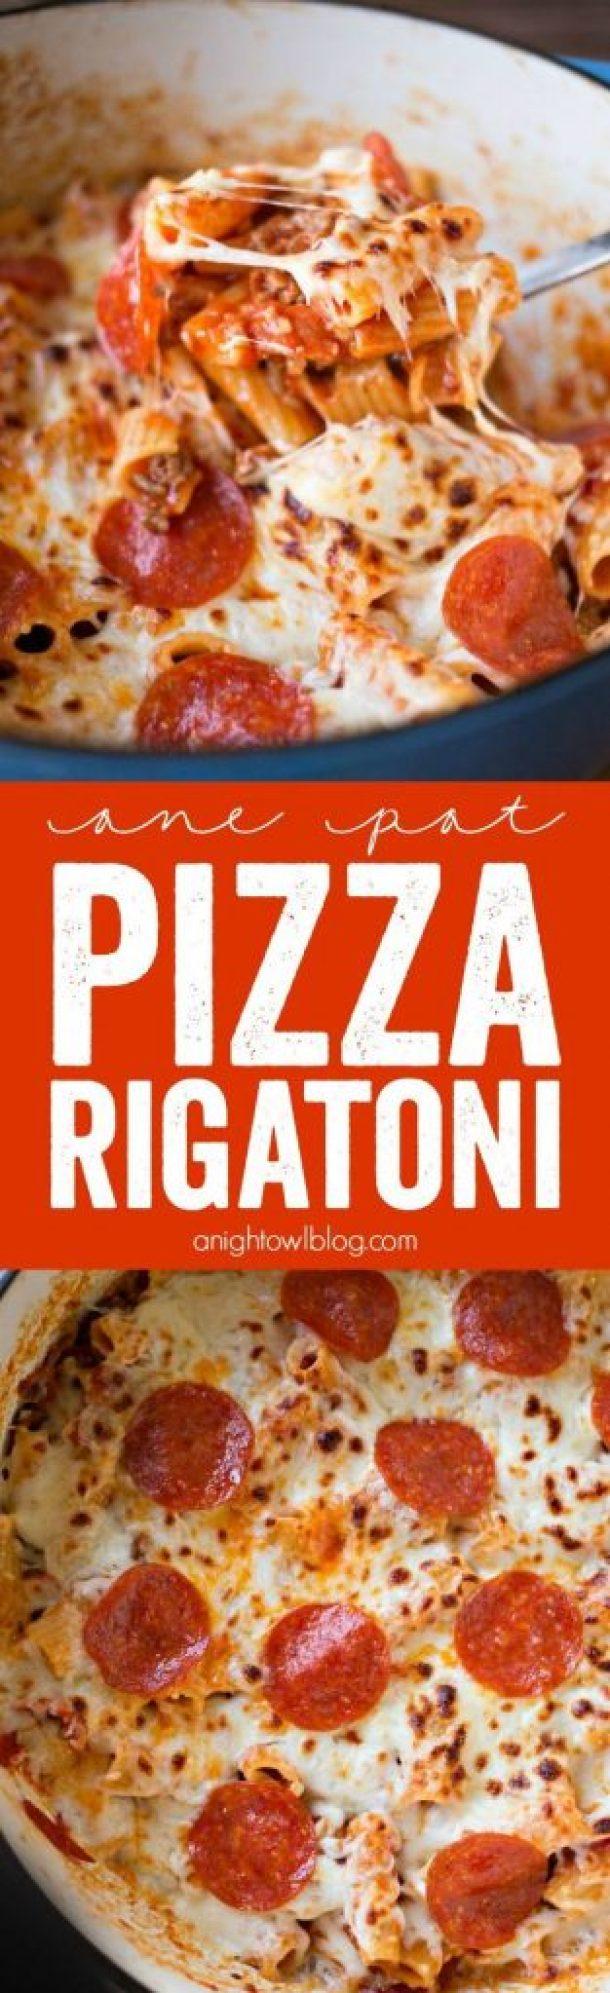 One Pot Pizza Rigatoni Recipe | A Night Owl Blog